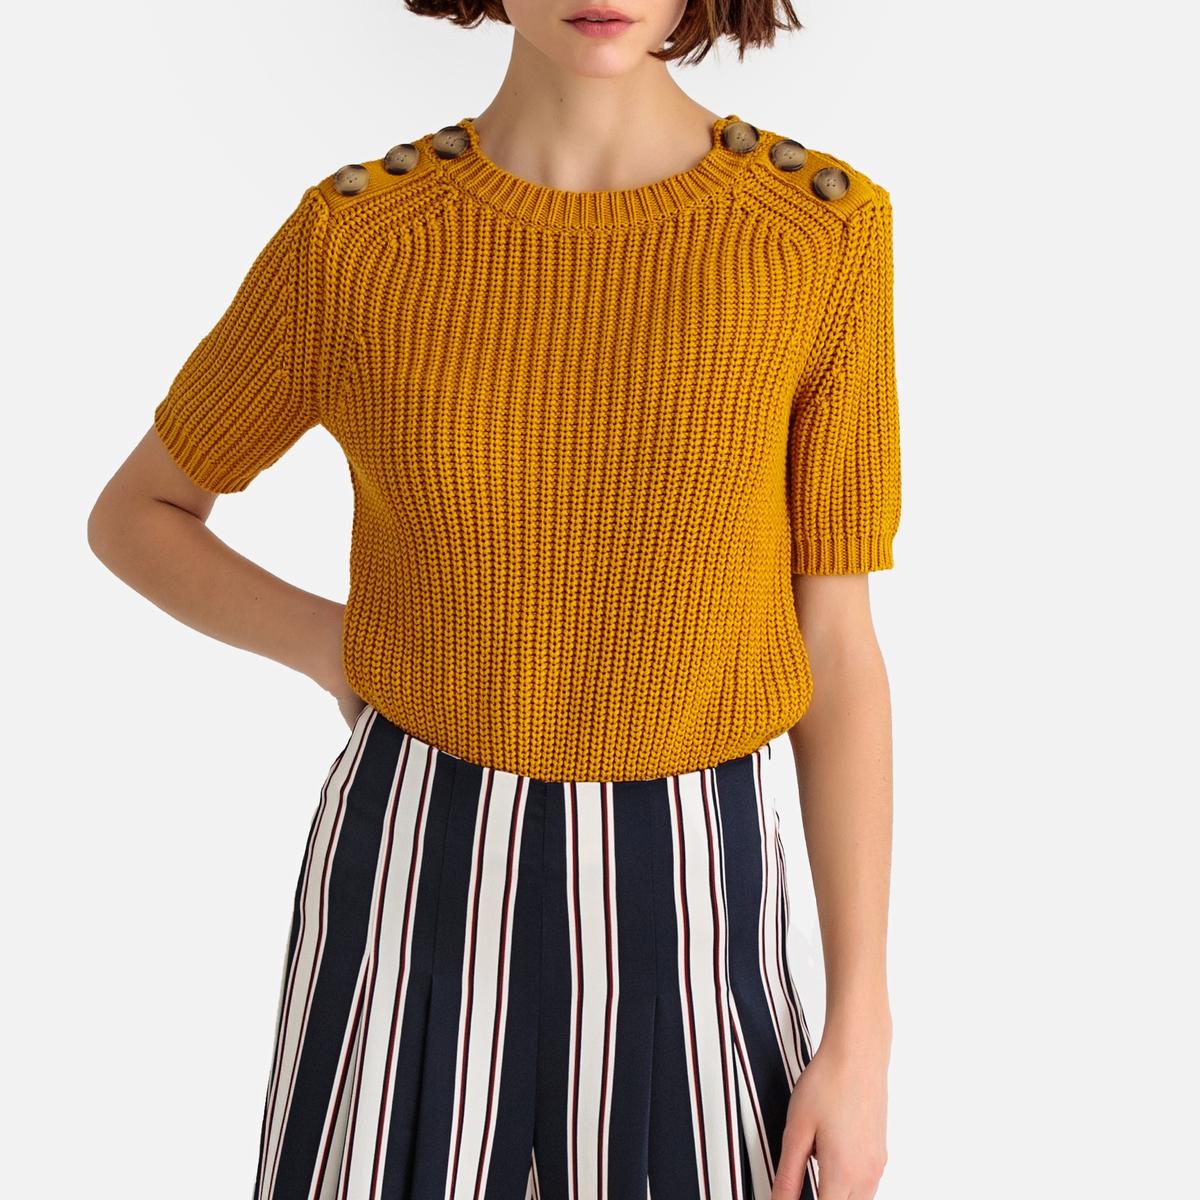 цена Пуловер La Redoute С короткими рукавами из плотного хлопкового трикотажа XXL желтый онлайн в 2017 году